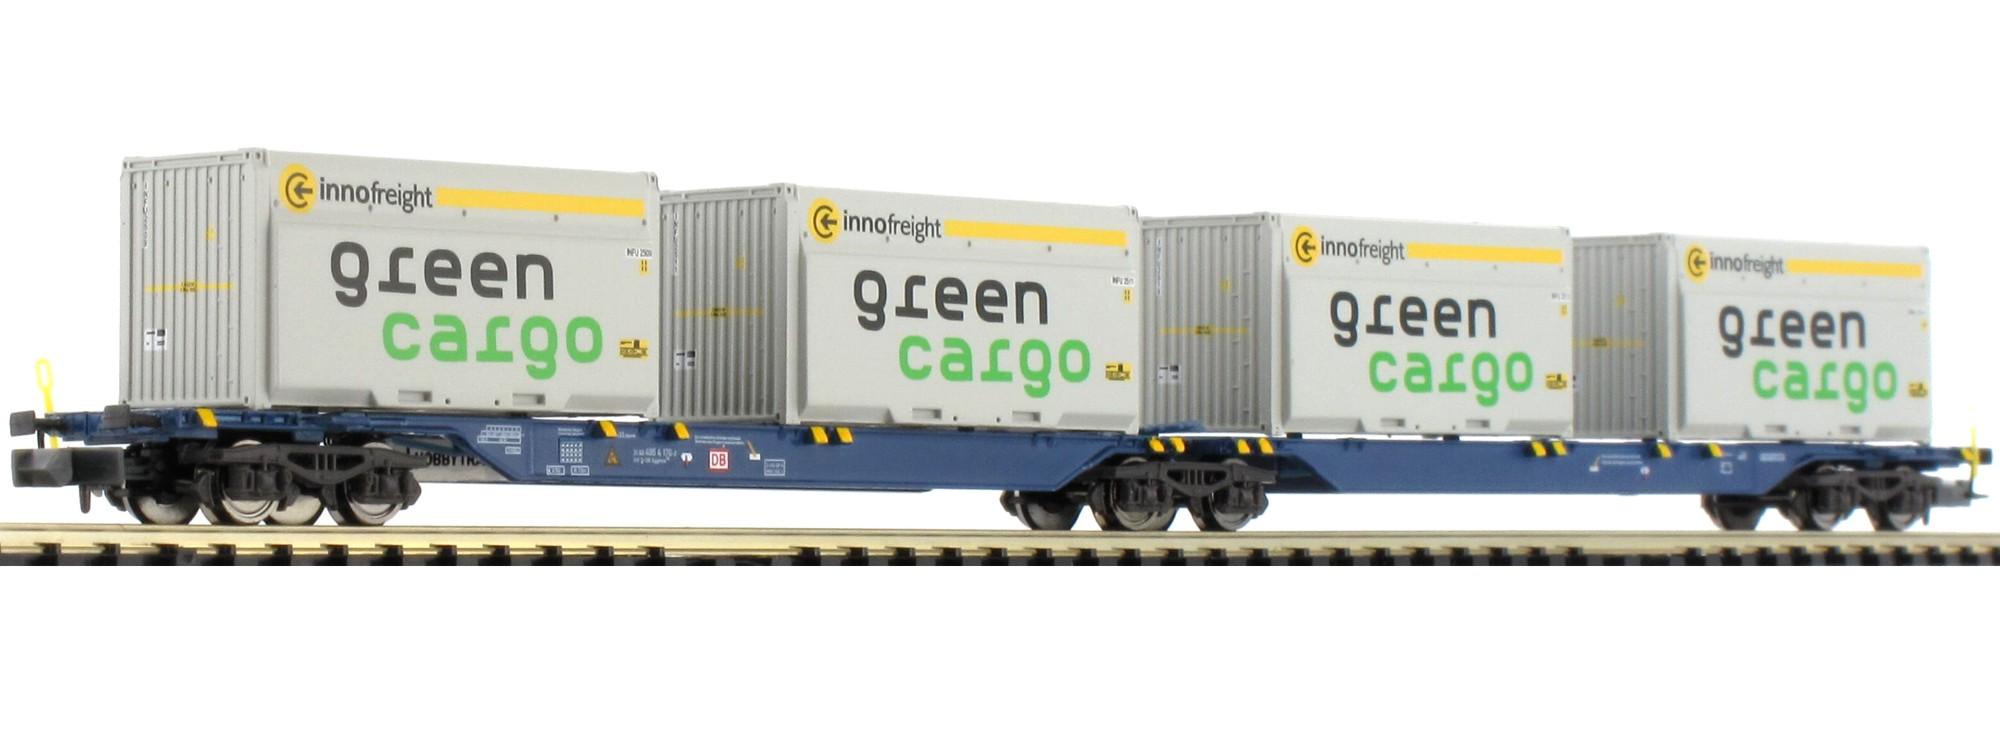 N Scale - Hobbytrain - H23718-1 - Flatcar, Sgkkms - Deutsche Bahn - 2-Pack